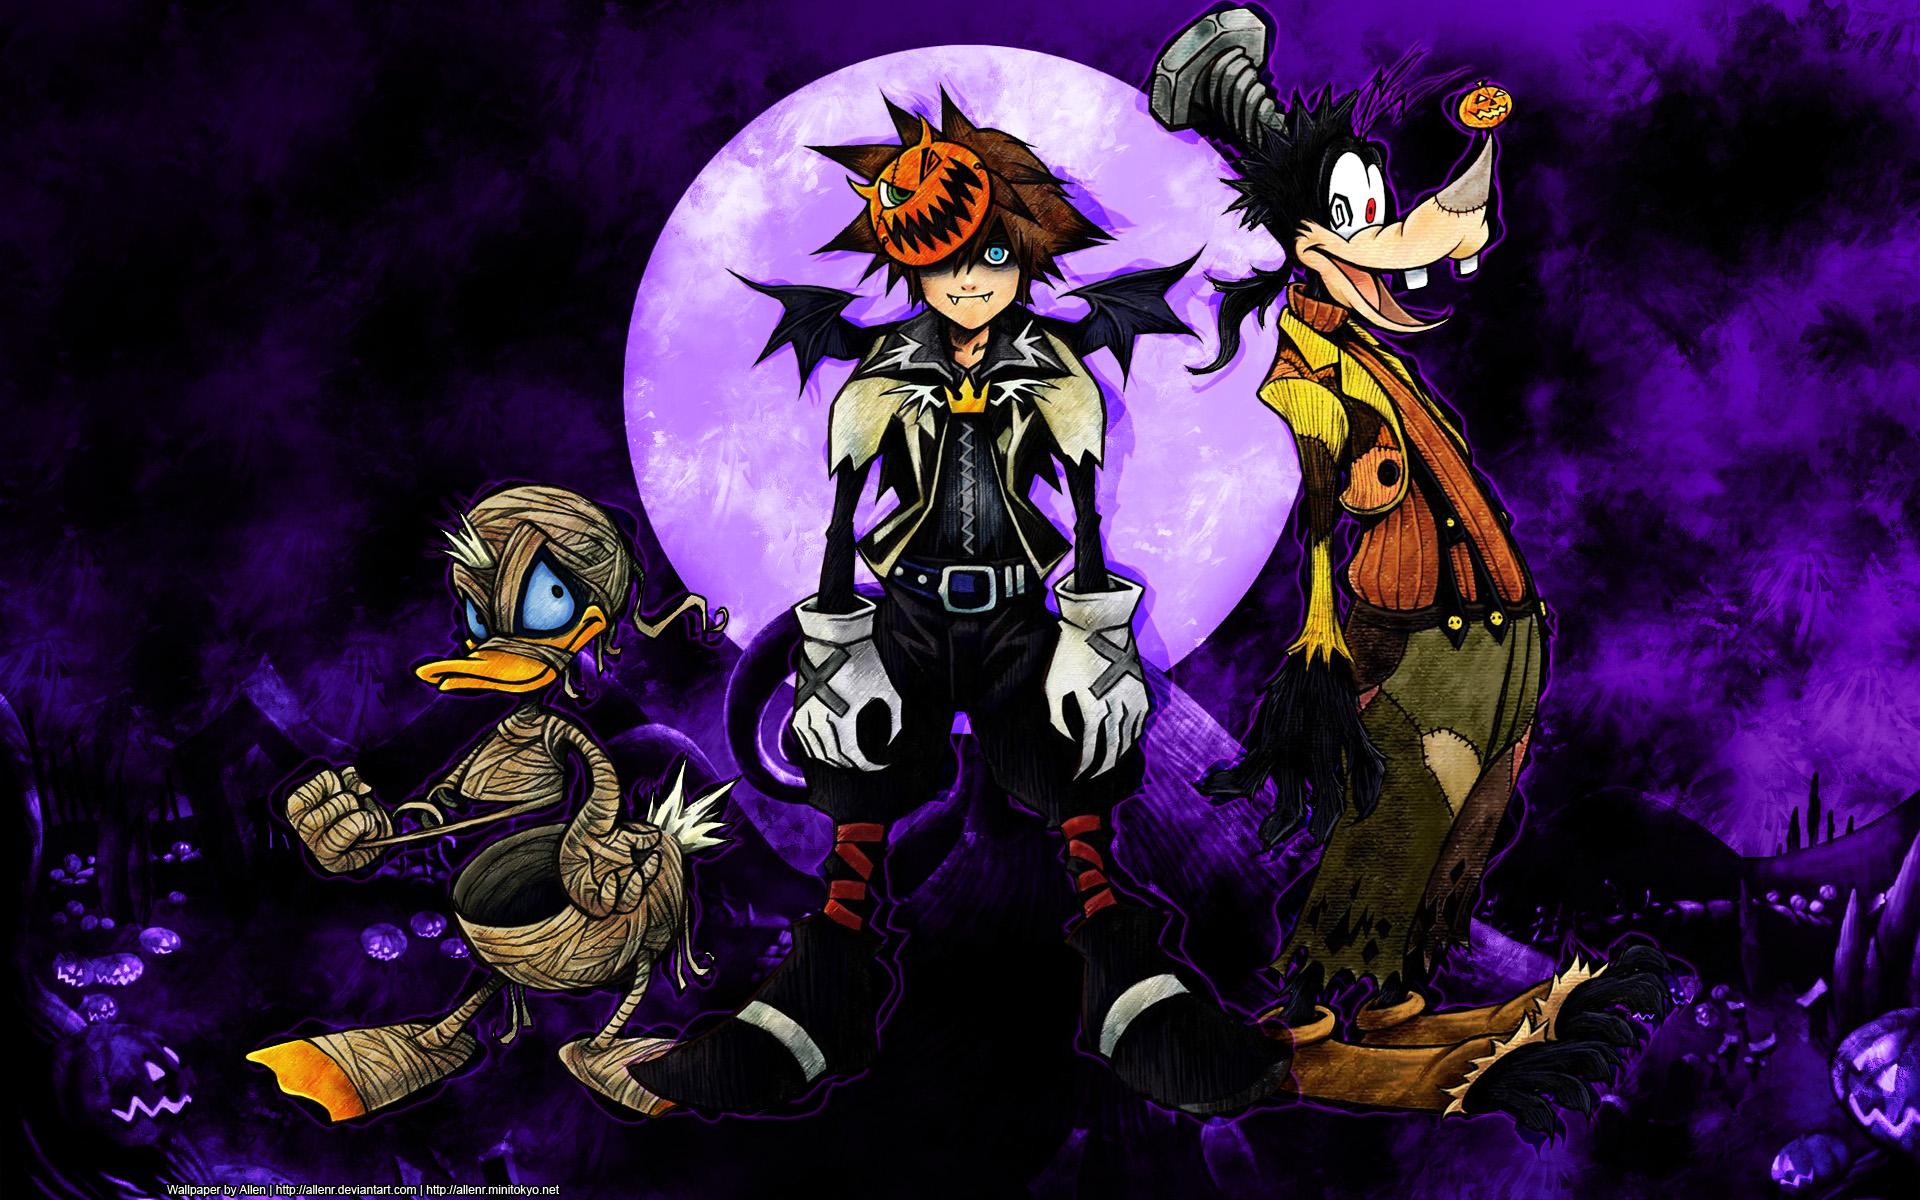 Most Inspiring Wallpaper Halloween Purple - 78c49237f0544afc0b7b40ccdfa00f65  Graphic_672210.jpg